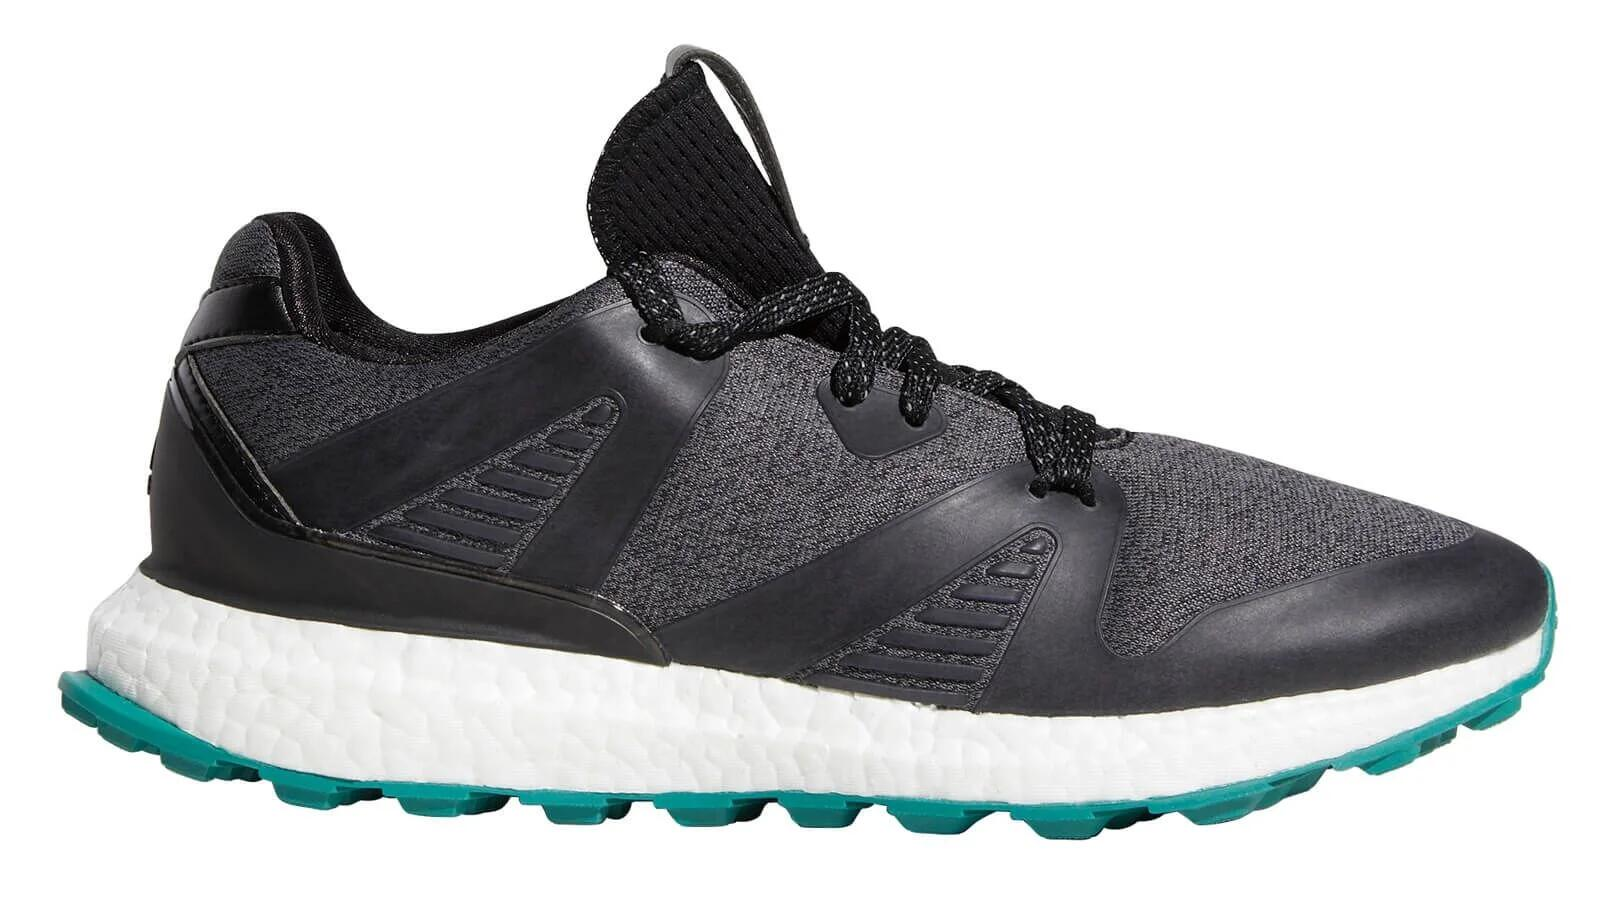 Adidas Crossknit 3 0 Golf Shoes Black Grey Active Green Carl S Golfland